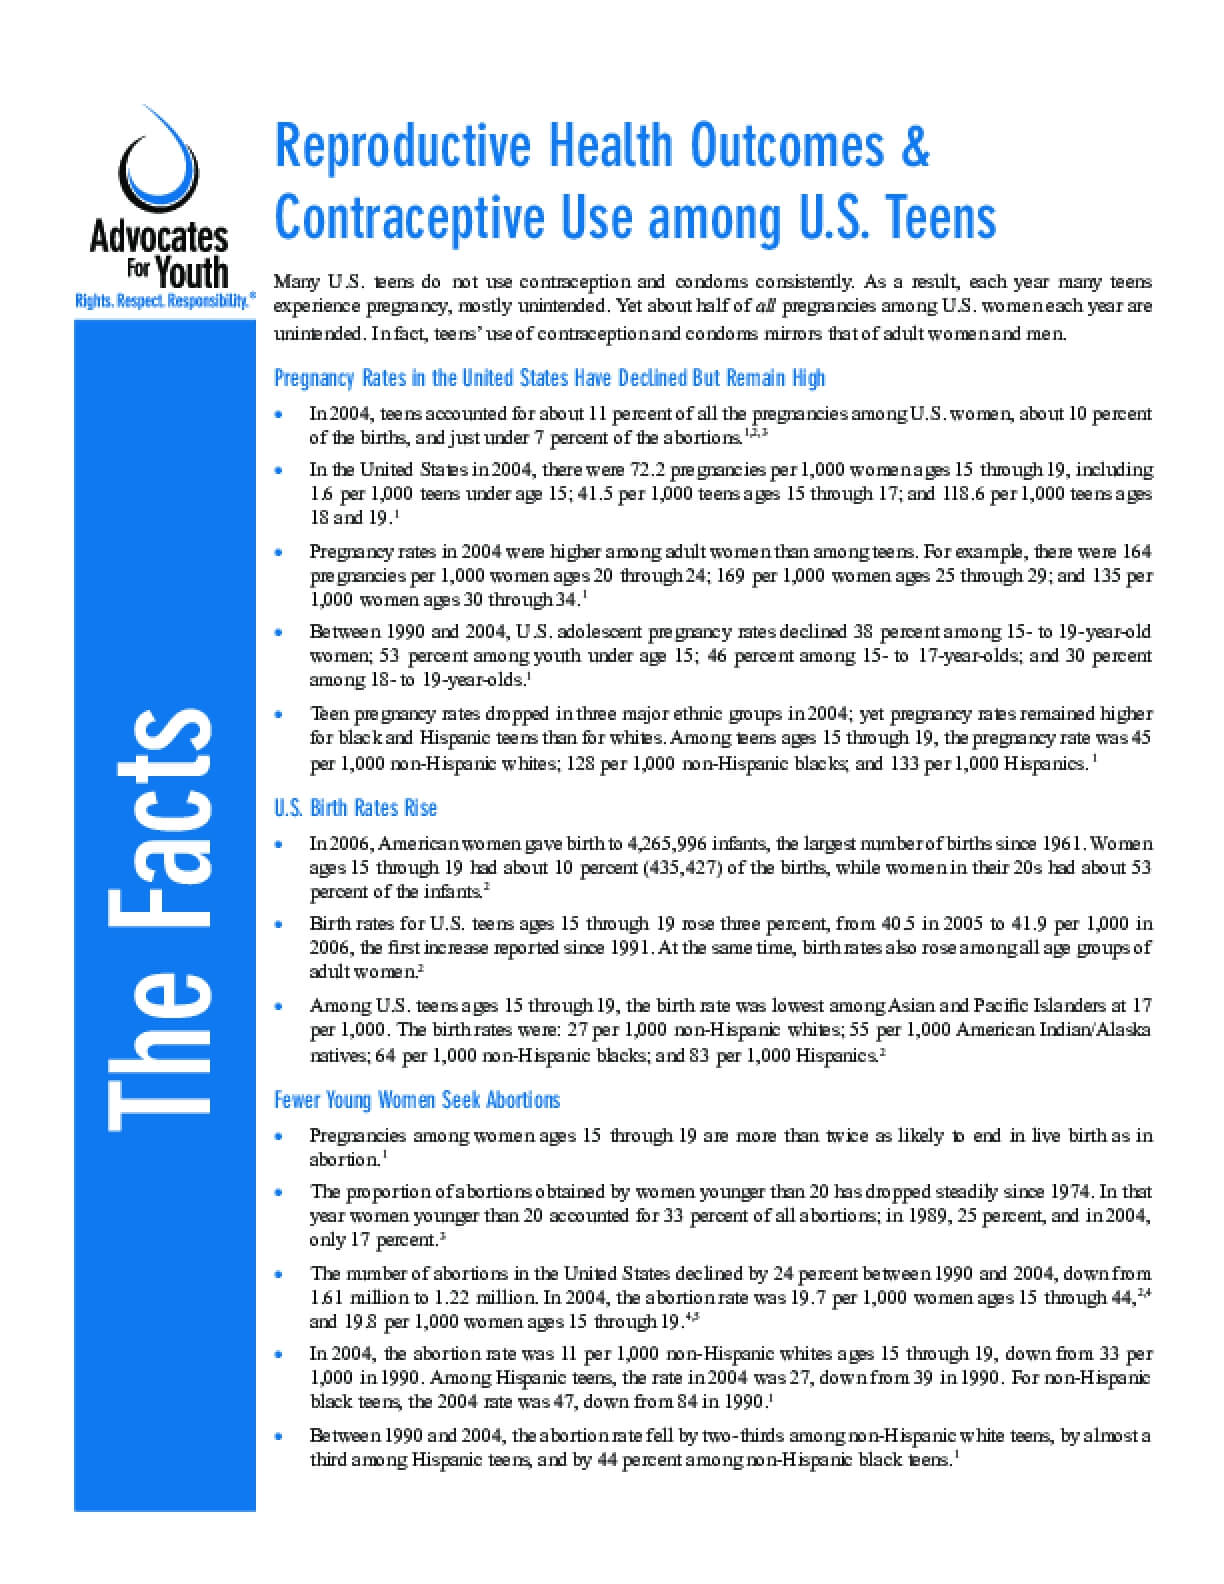 Reproductive Health Outcomes & Contraceptive Use among U.S. Teens